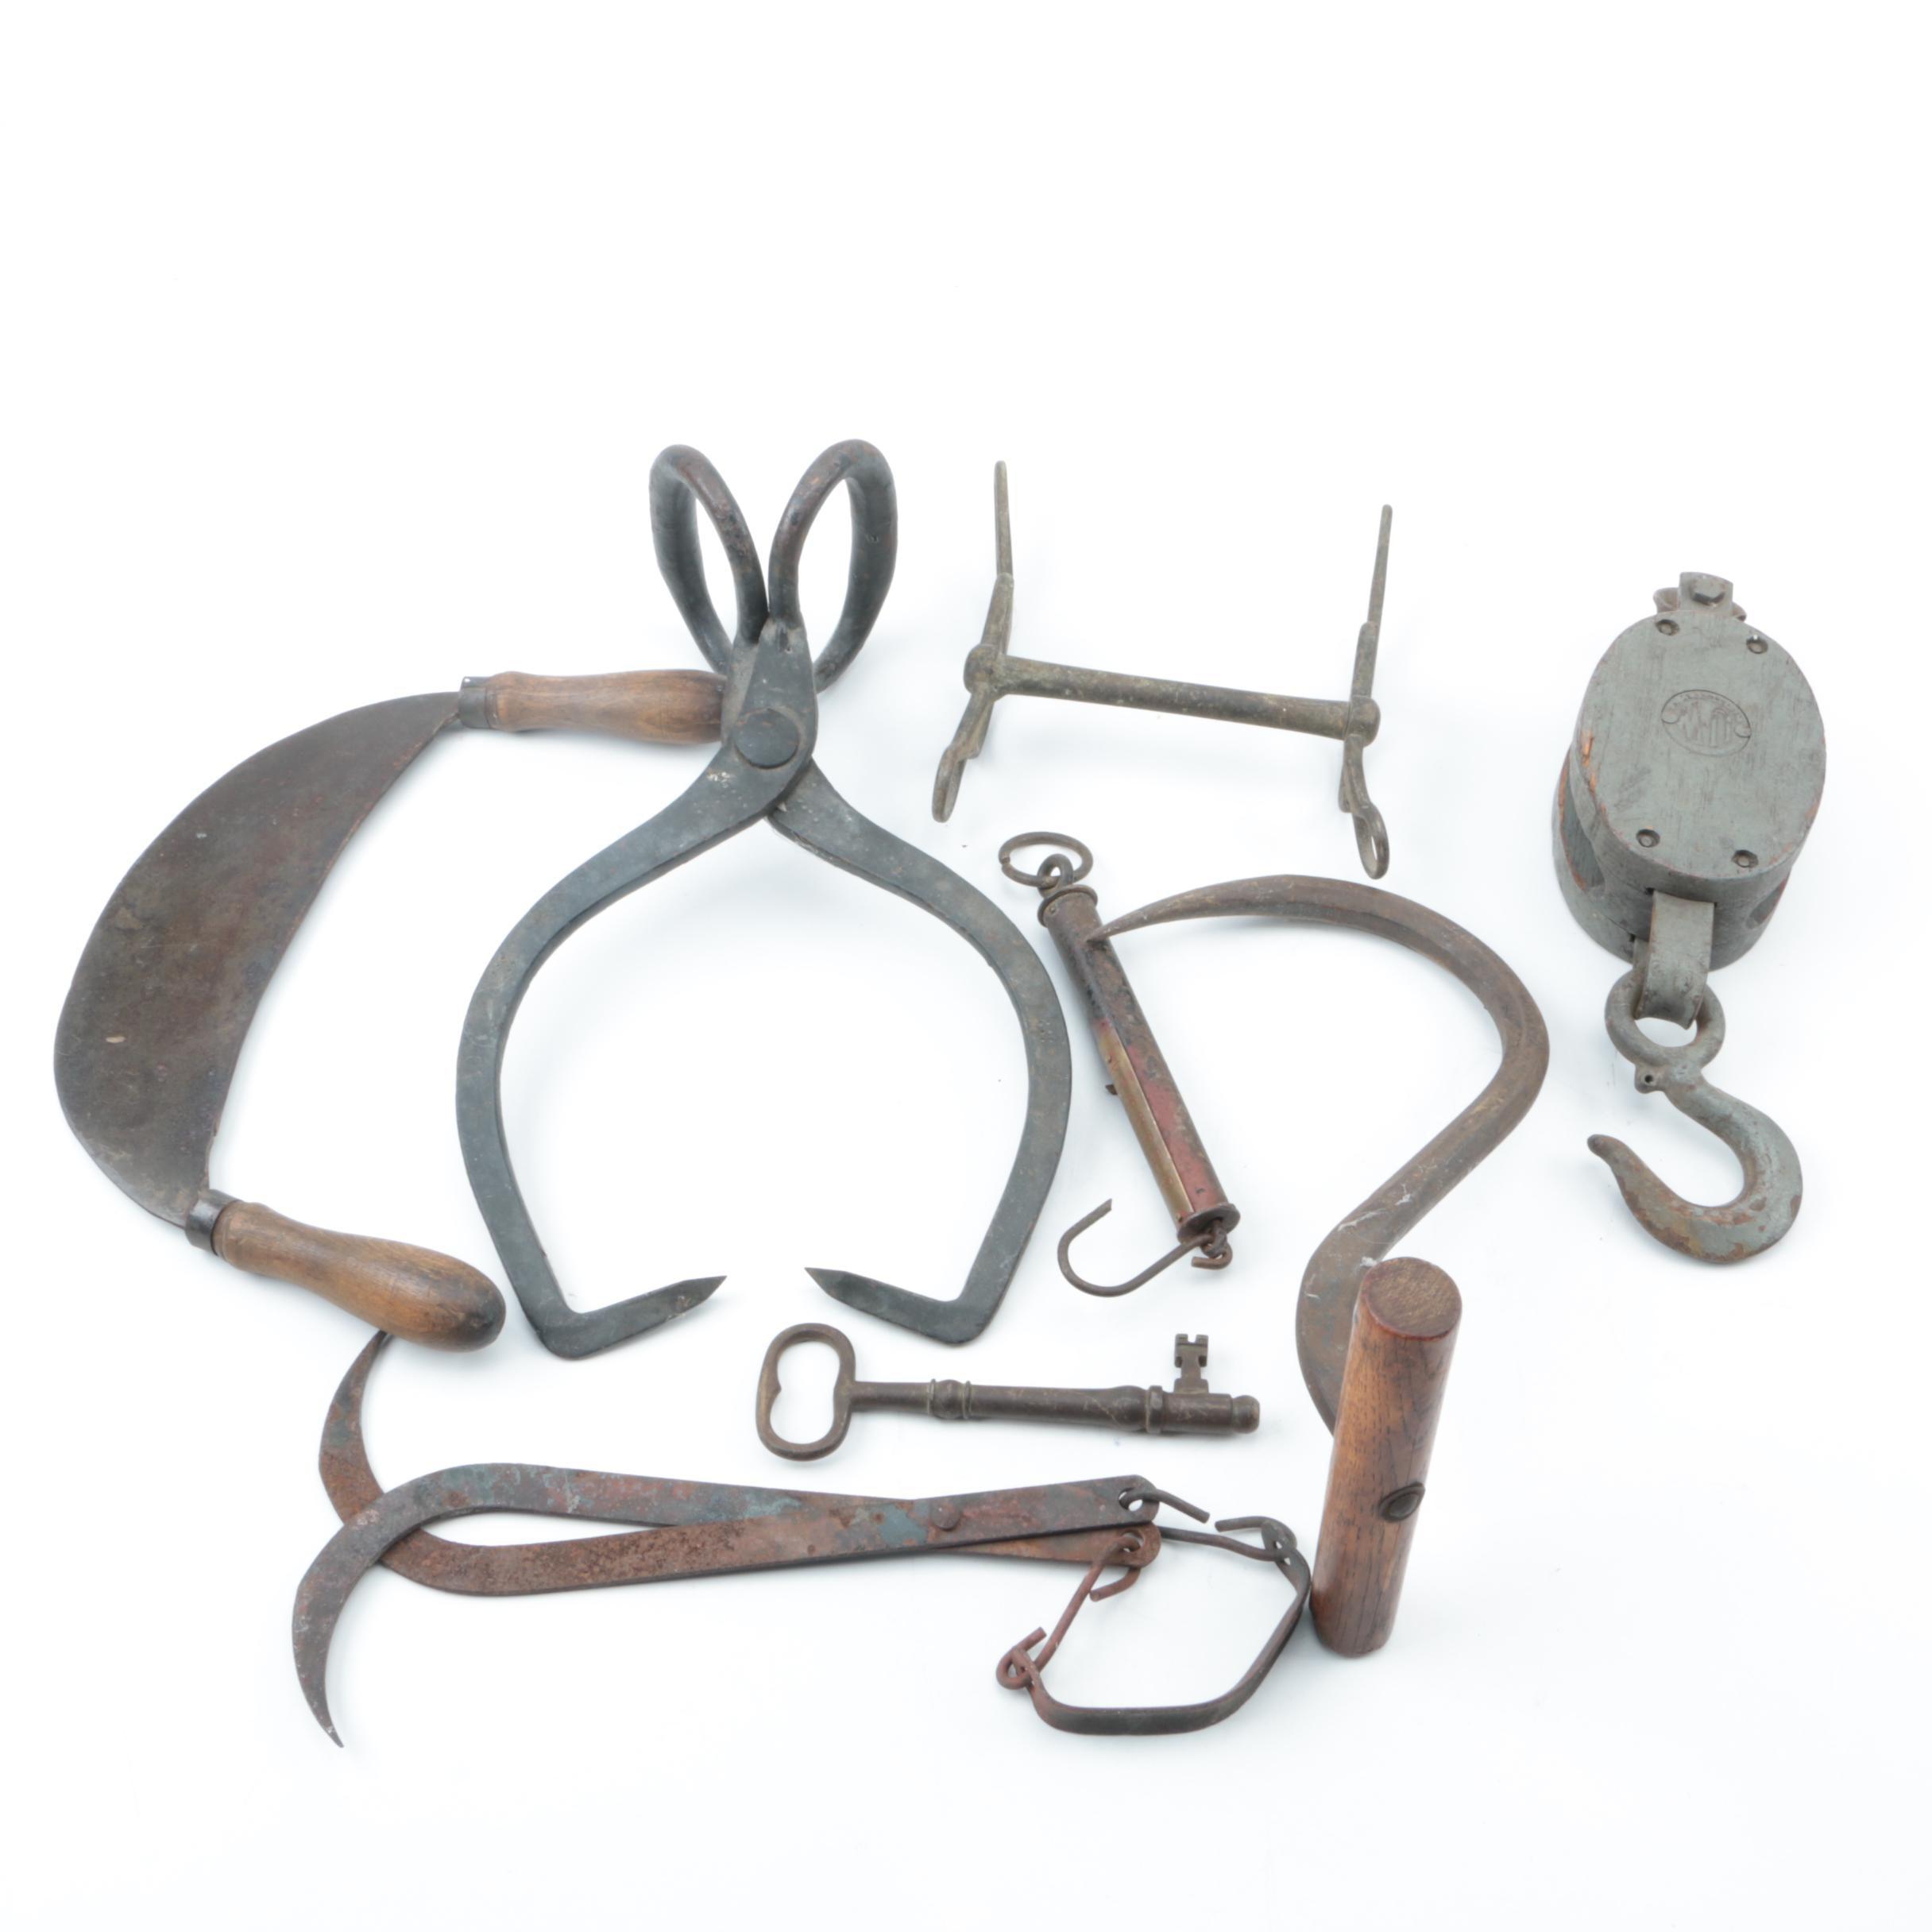 Vintage Metal Field Tools